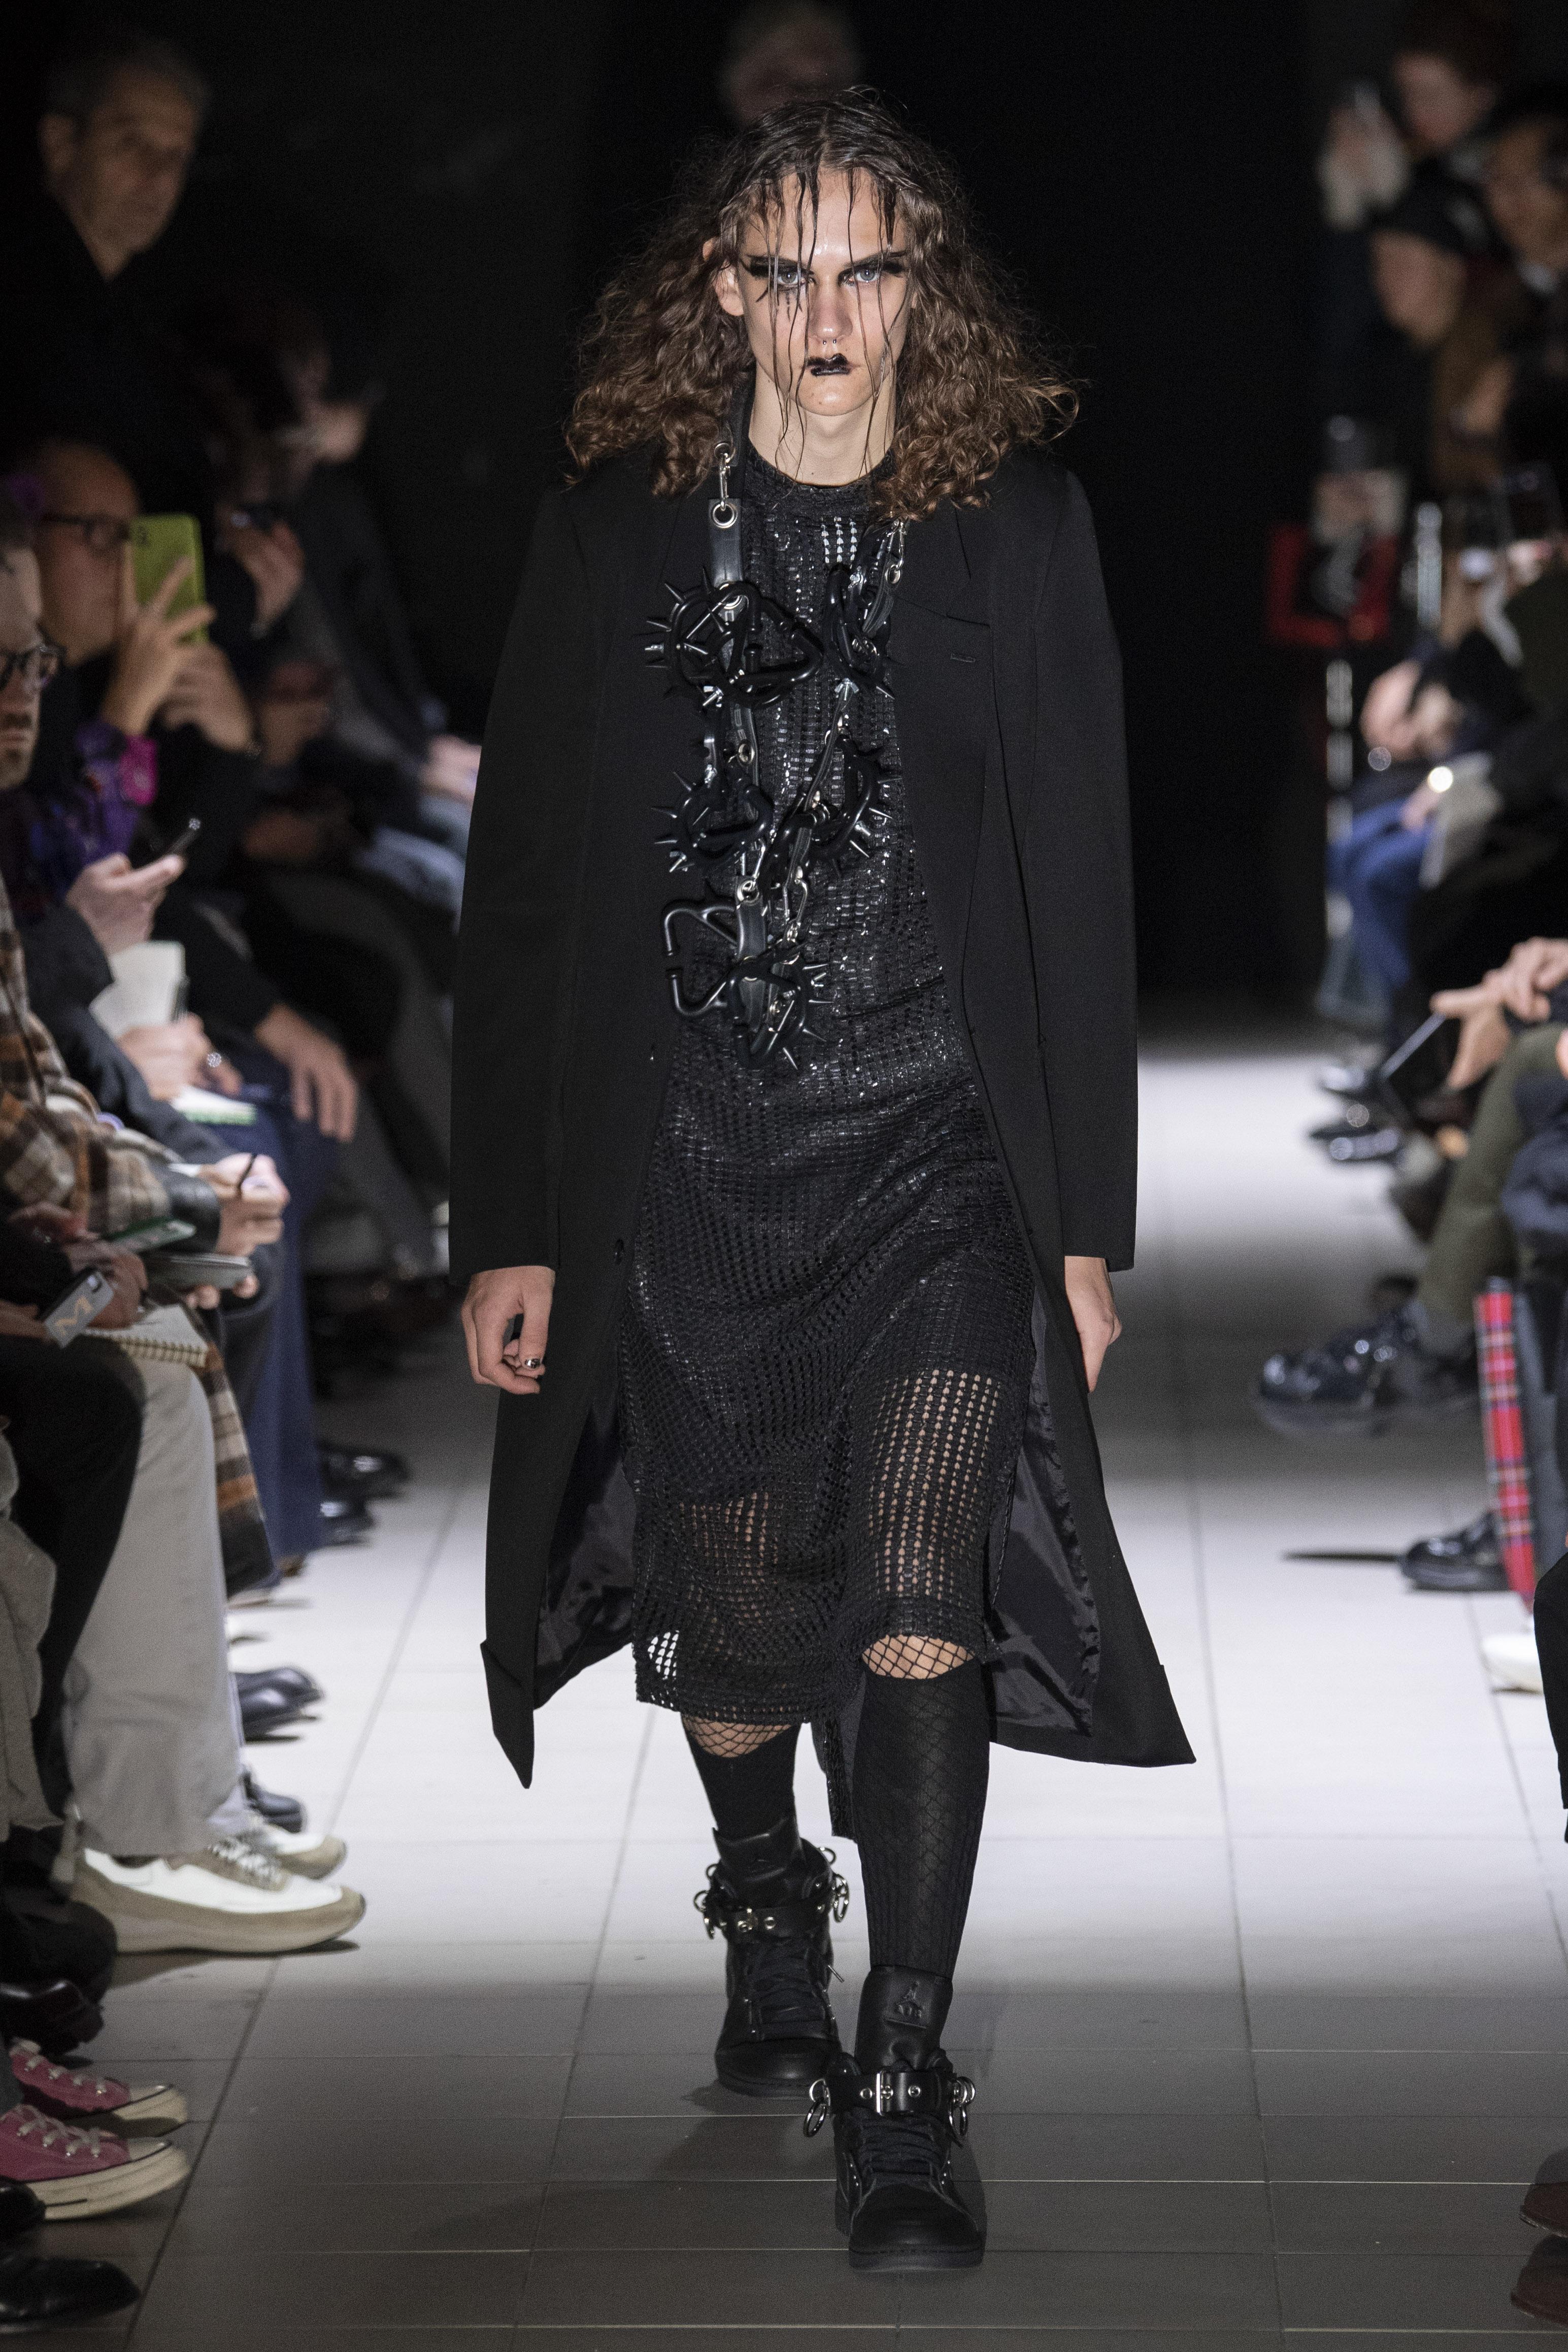 ce842c2d772 Kawakubo debuted a brand new Comme des Garçons x Air Jordan 1  collaboration